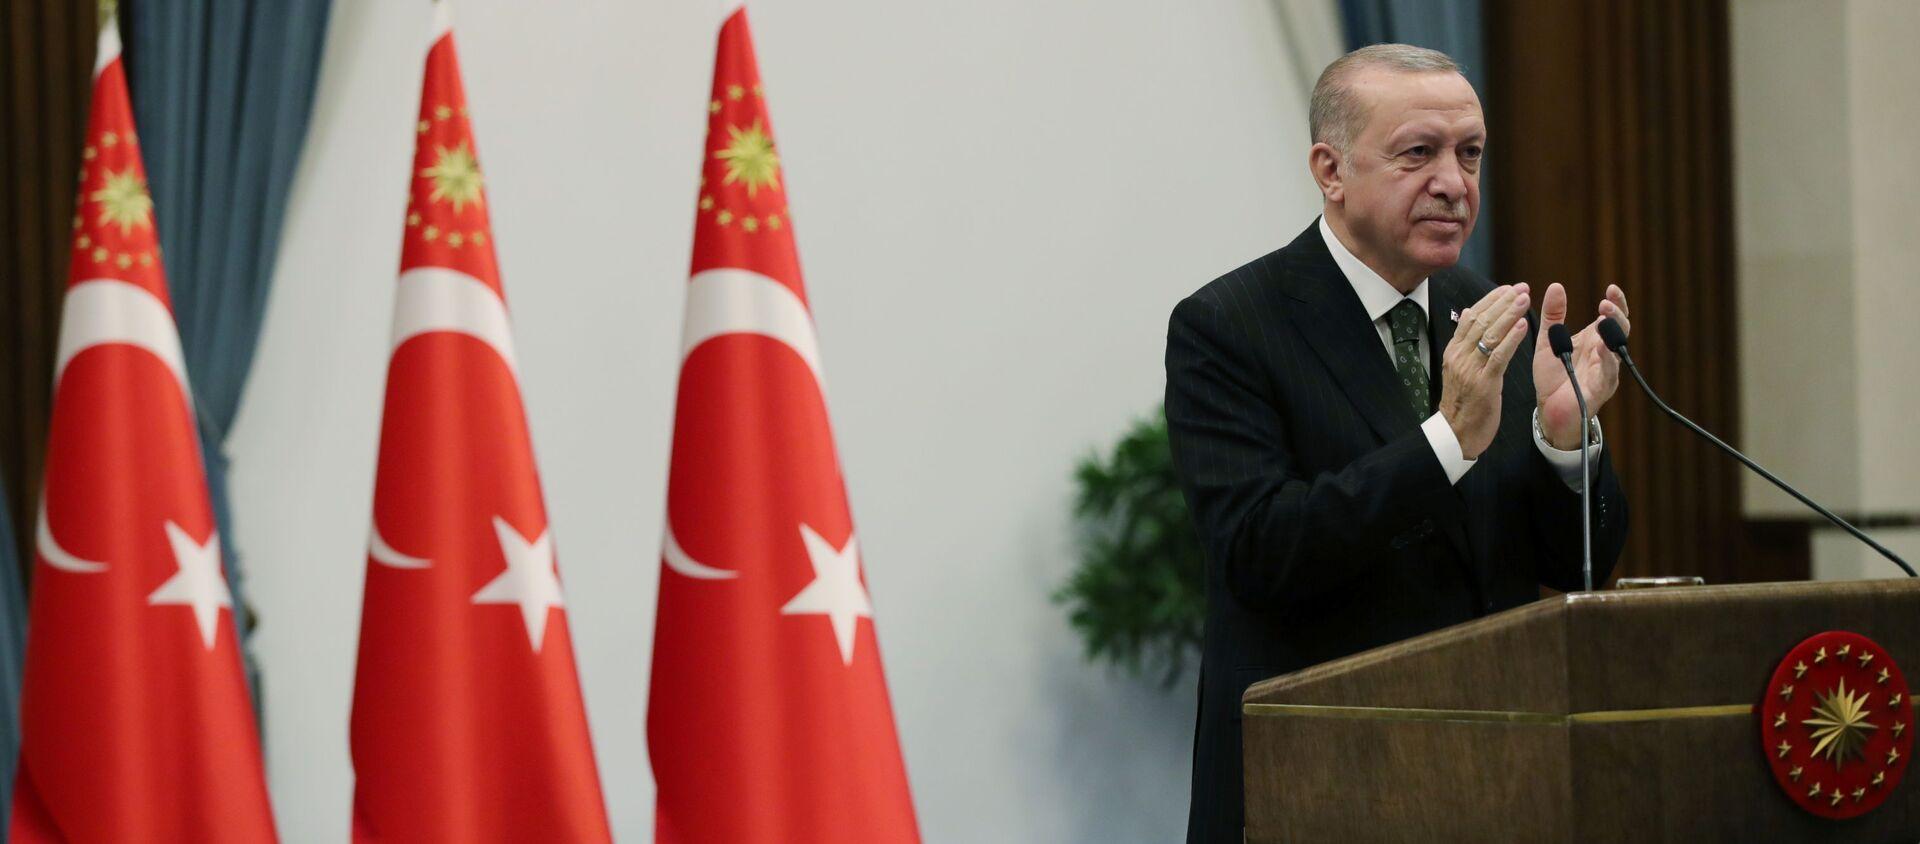 Президент Турции Реджеп Тайип Эрдоган, фото из архива  - Sputnik Азербайджан, 1920, 22.04.2021